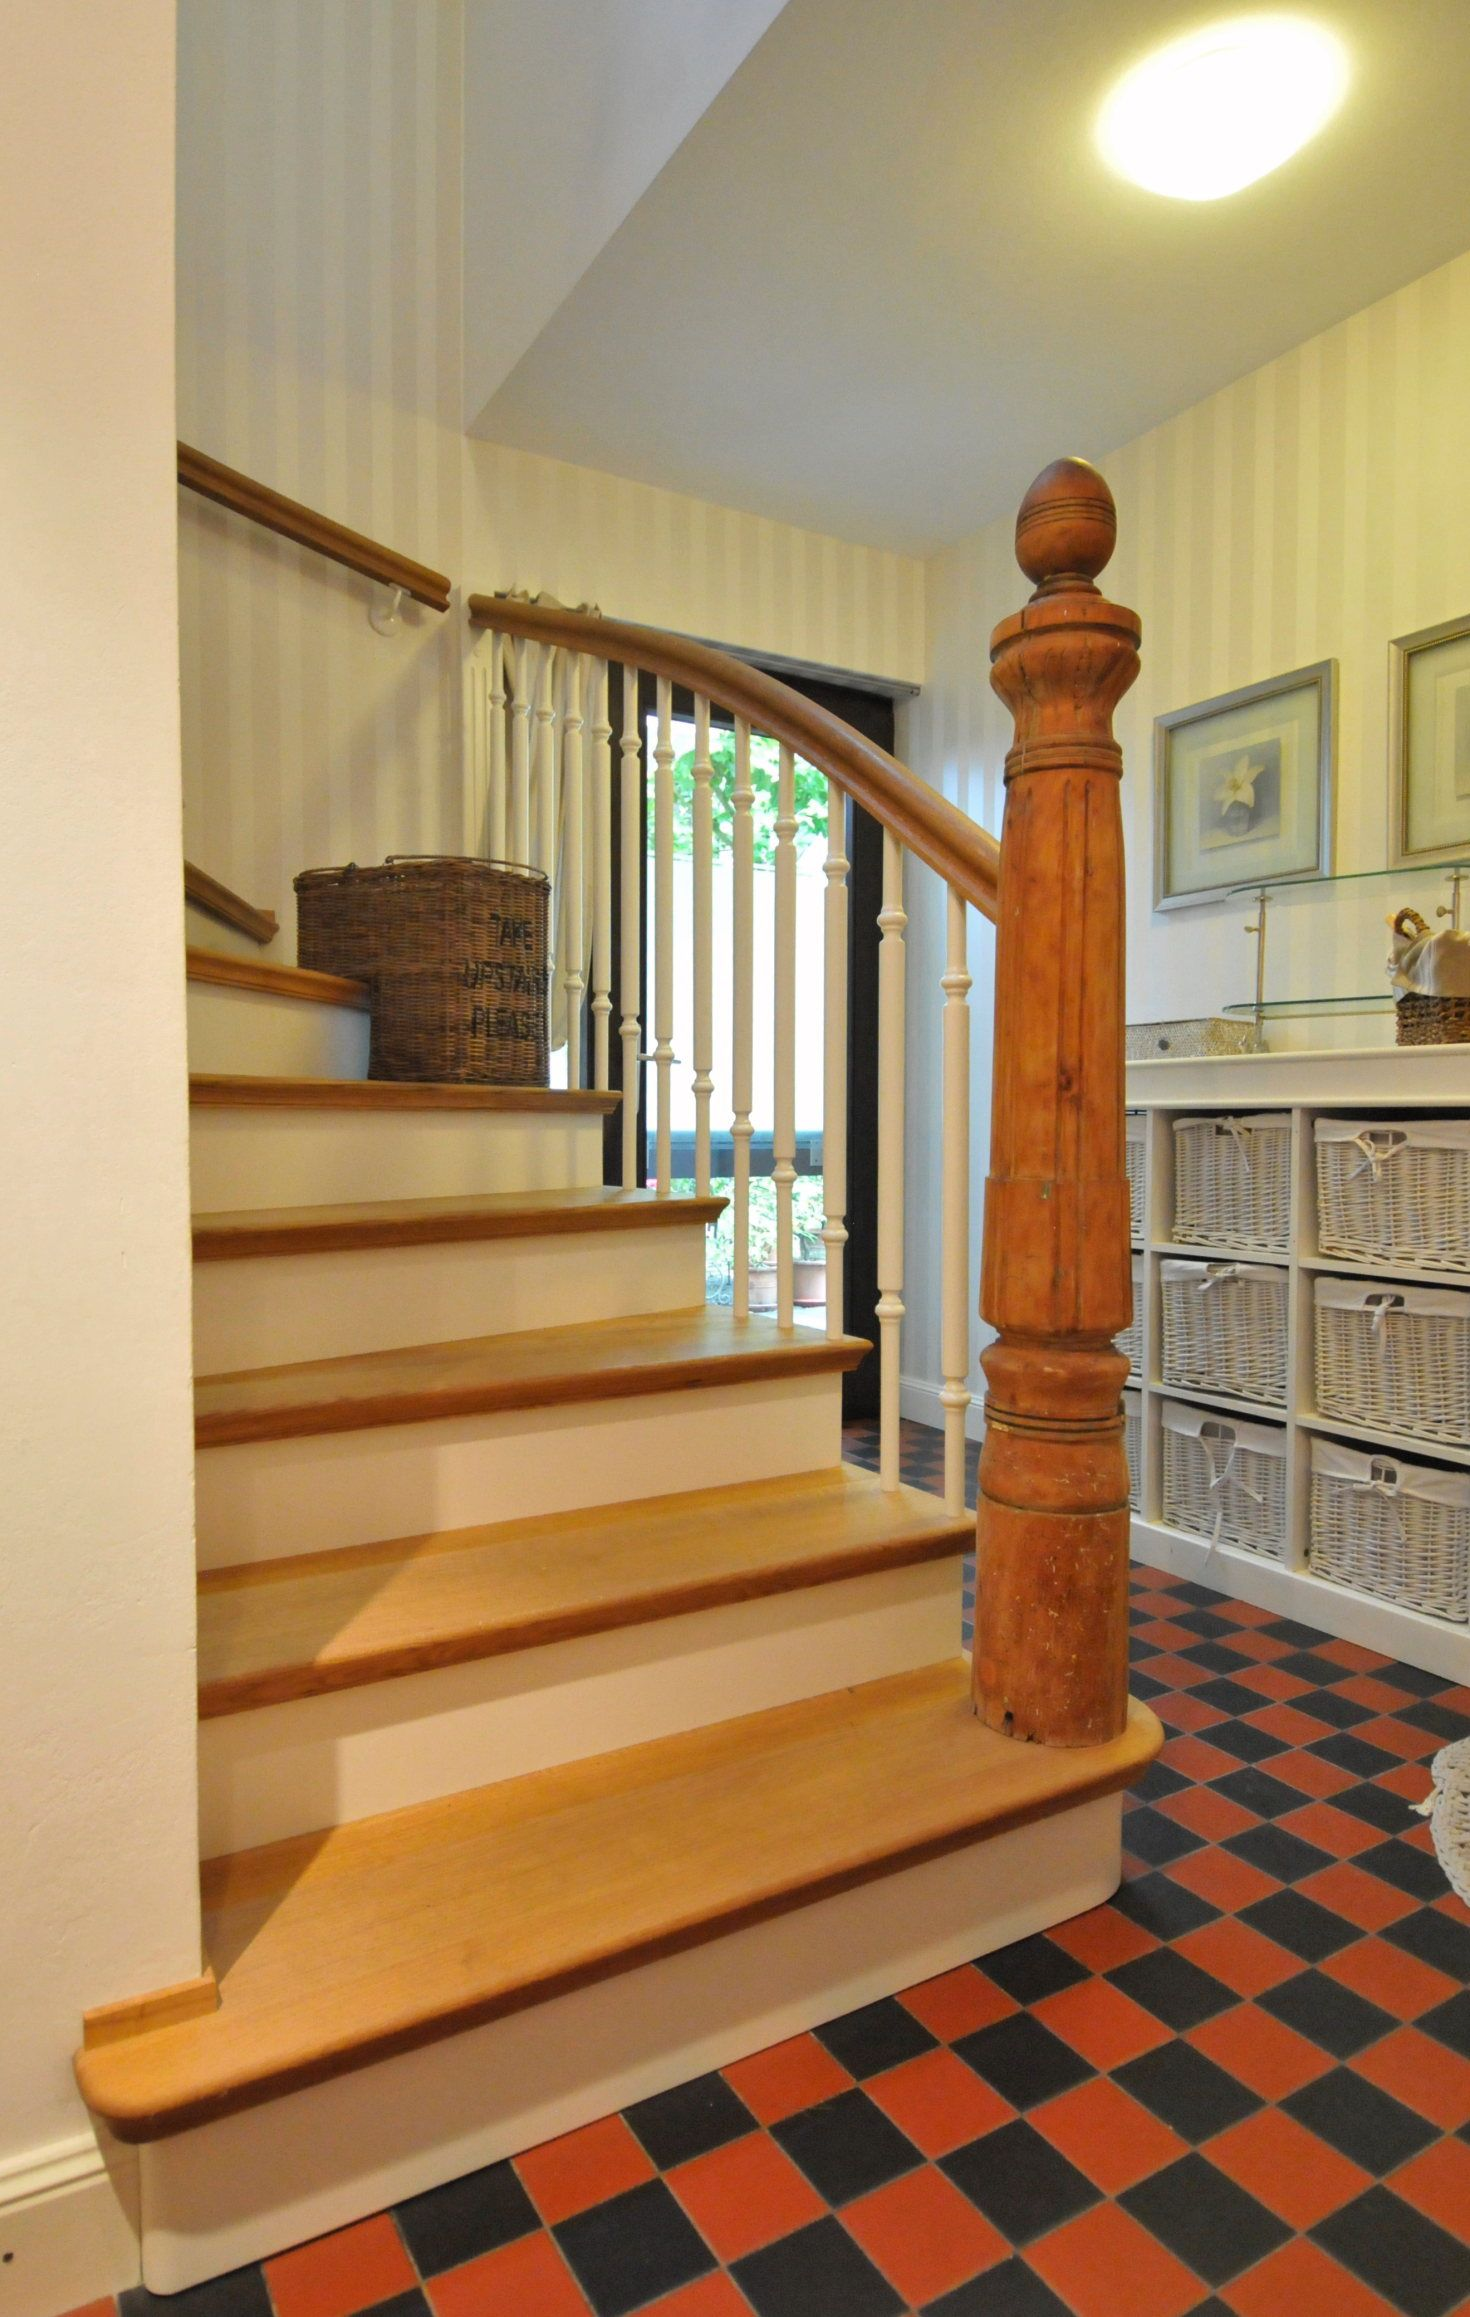 betontreppe holz-16_5 | treppe | pinterest | betontreppe, holz und